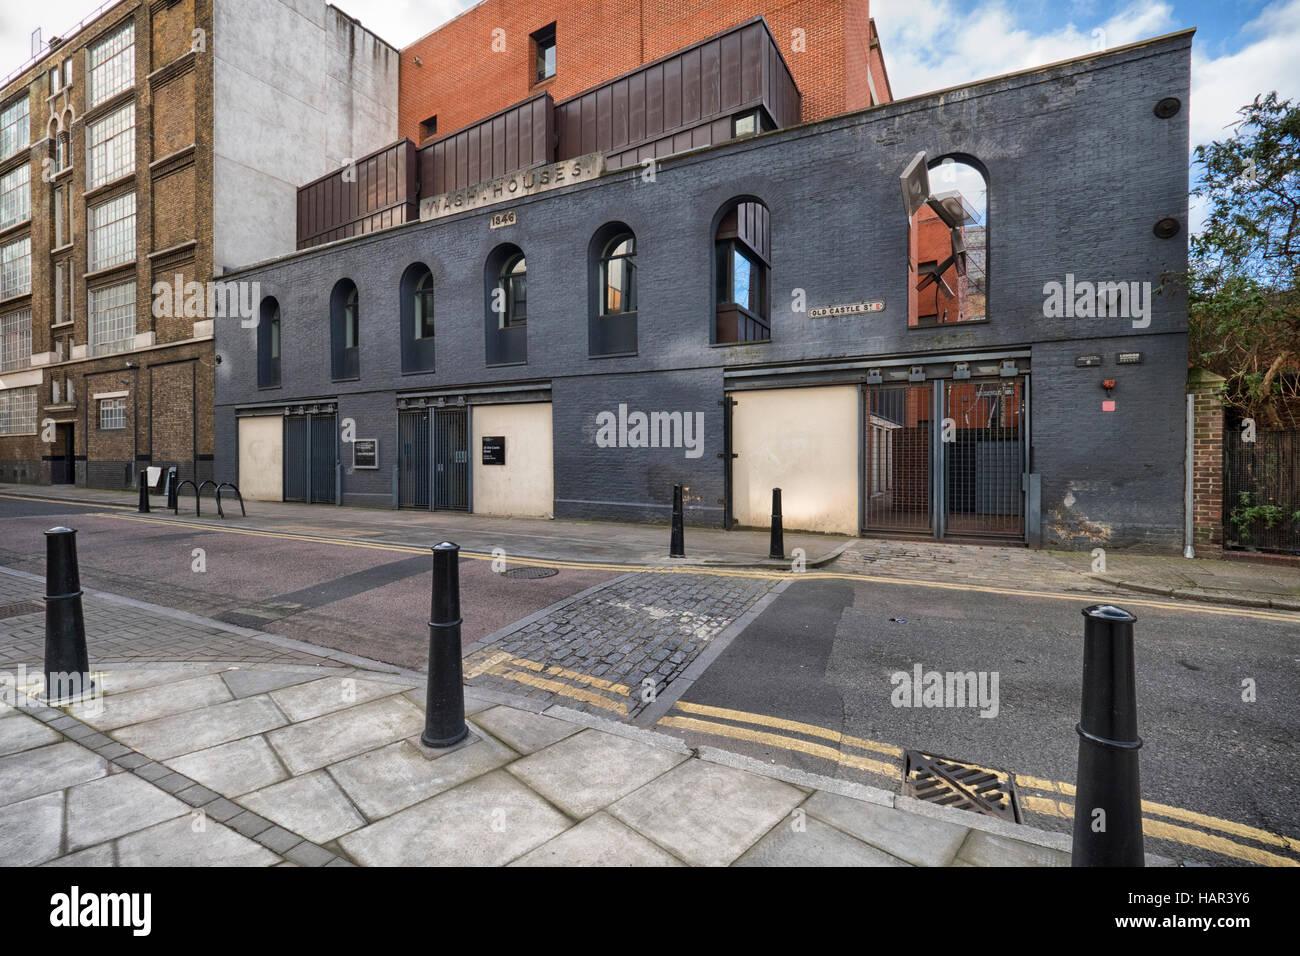 Old Castle Street wash house Whitechapel built in 1846 - Stock Image